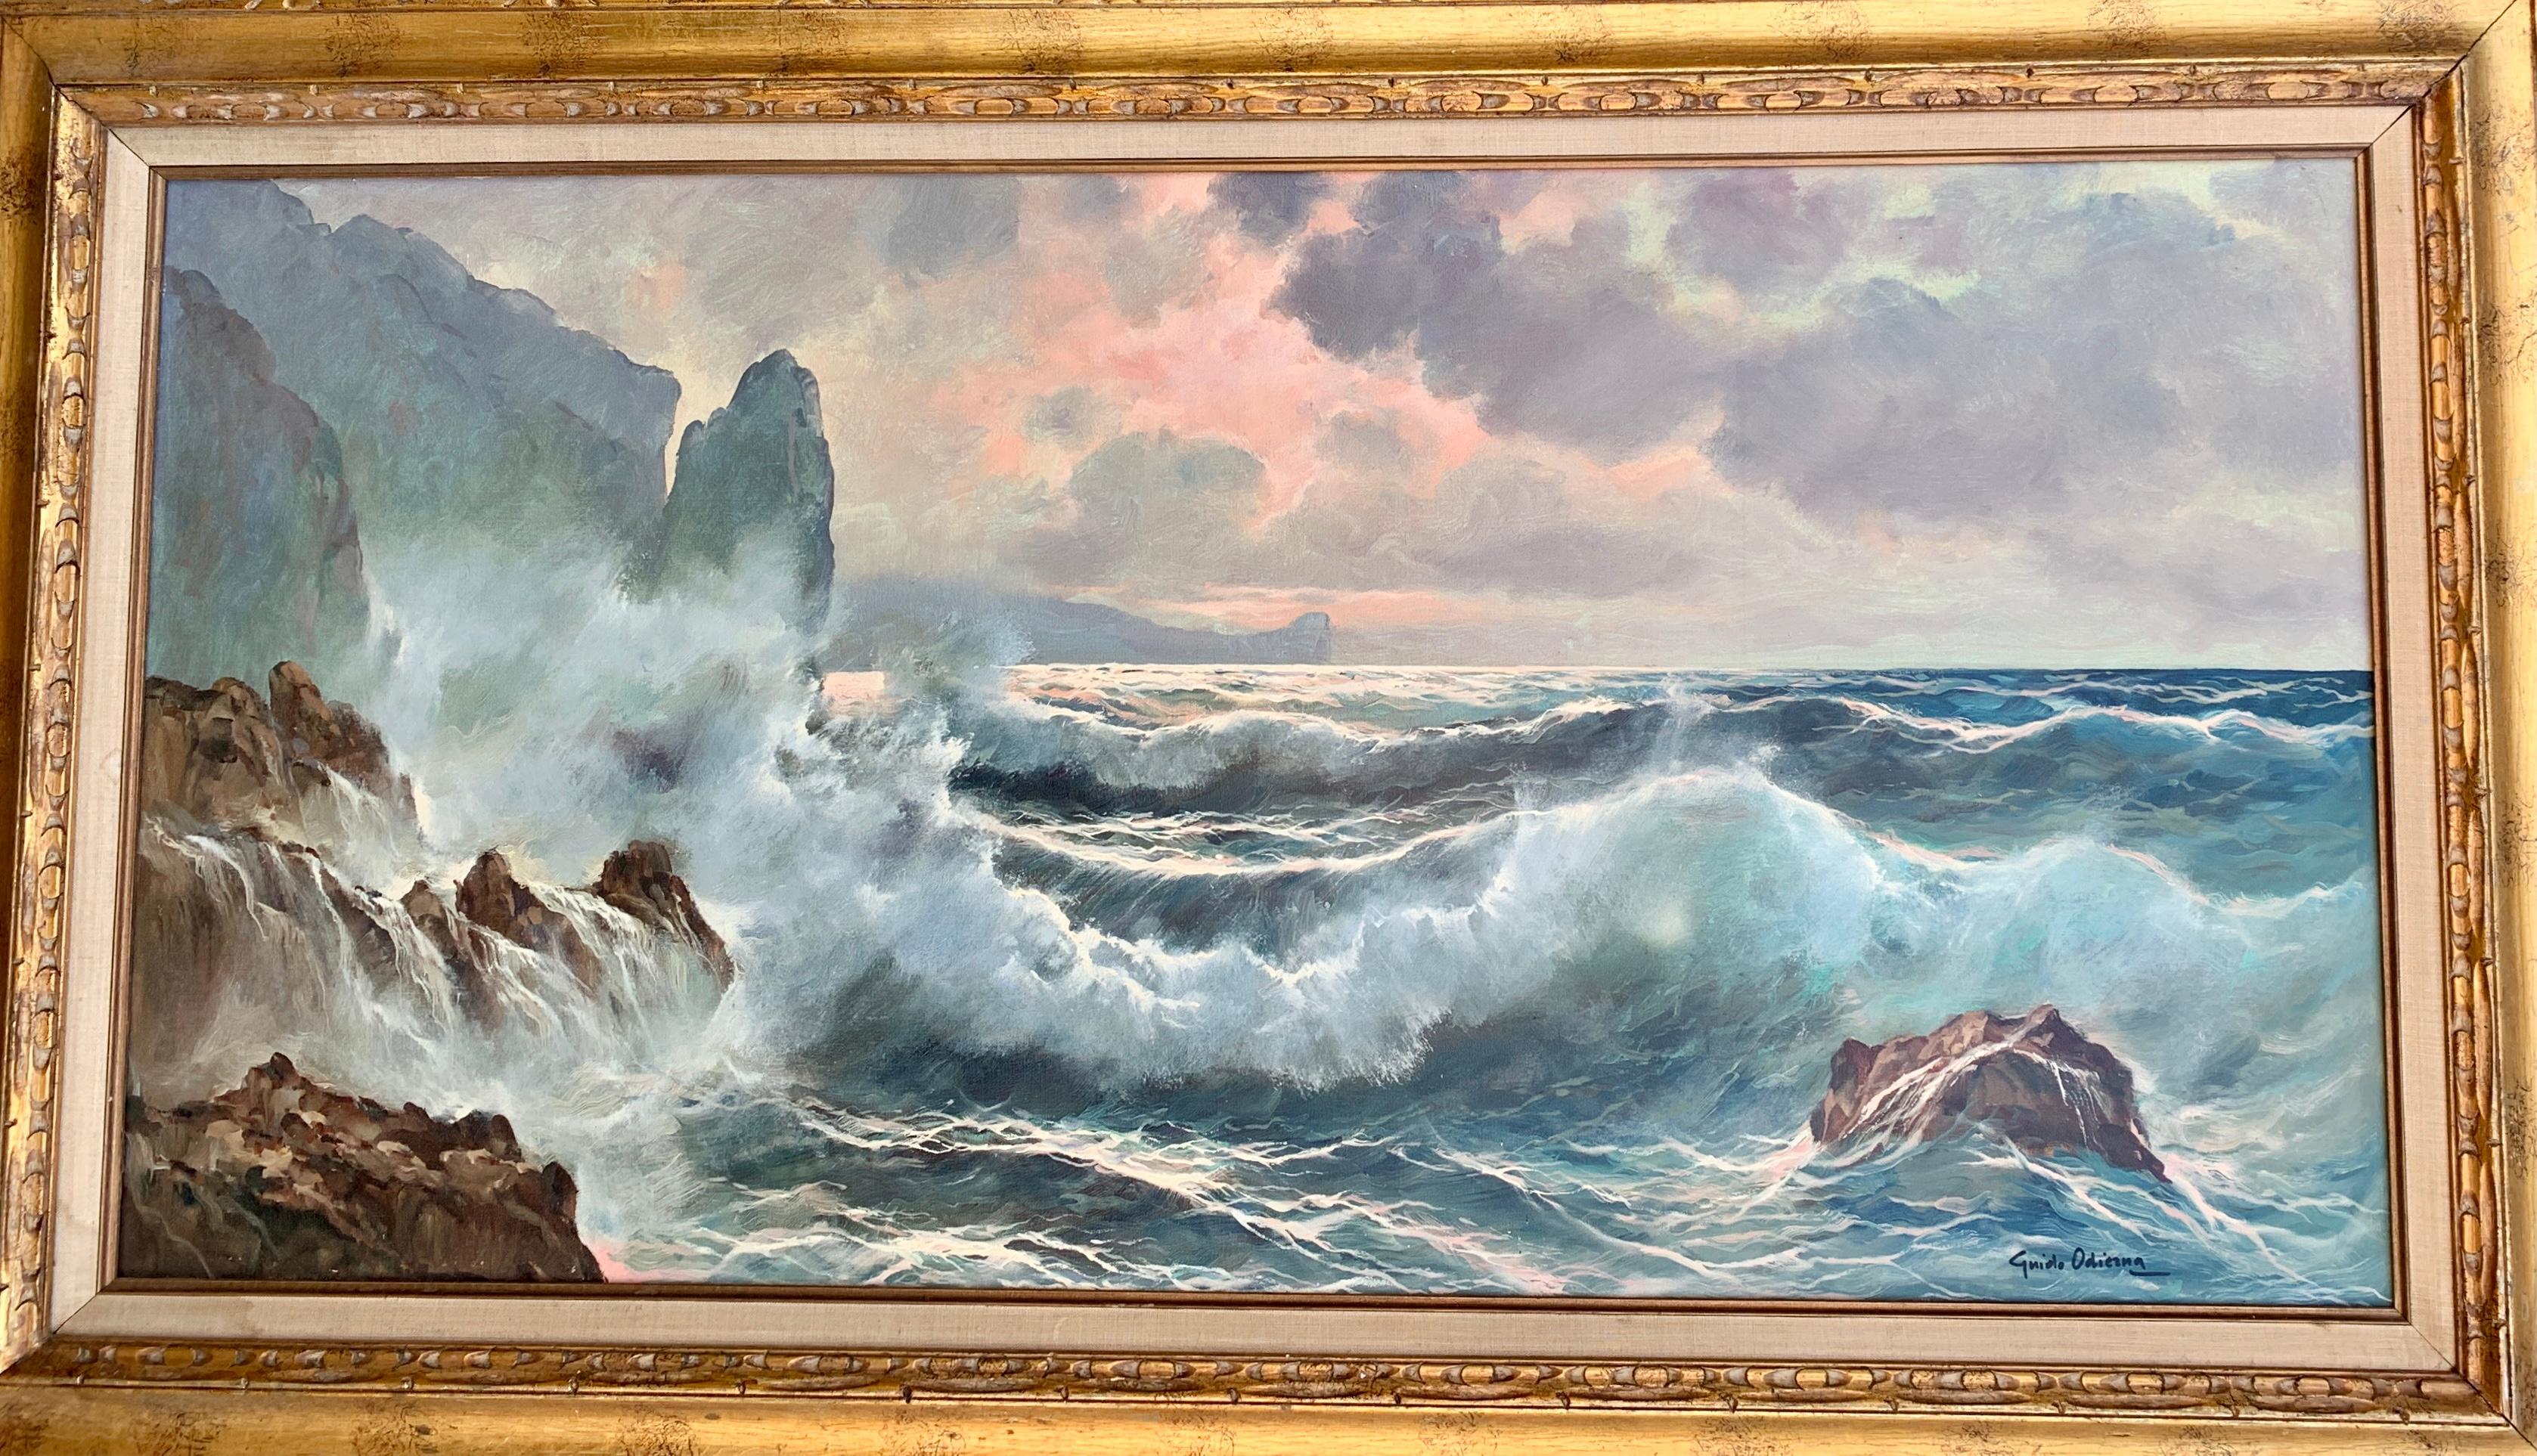 Southern Italian Coastal sea scene, waves crashing onto rocks, with sunsetting